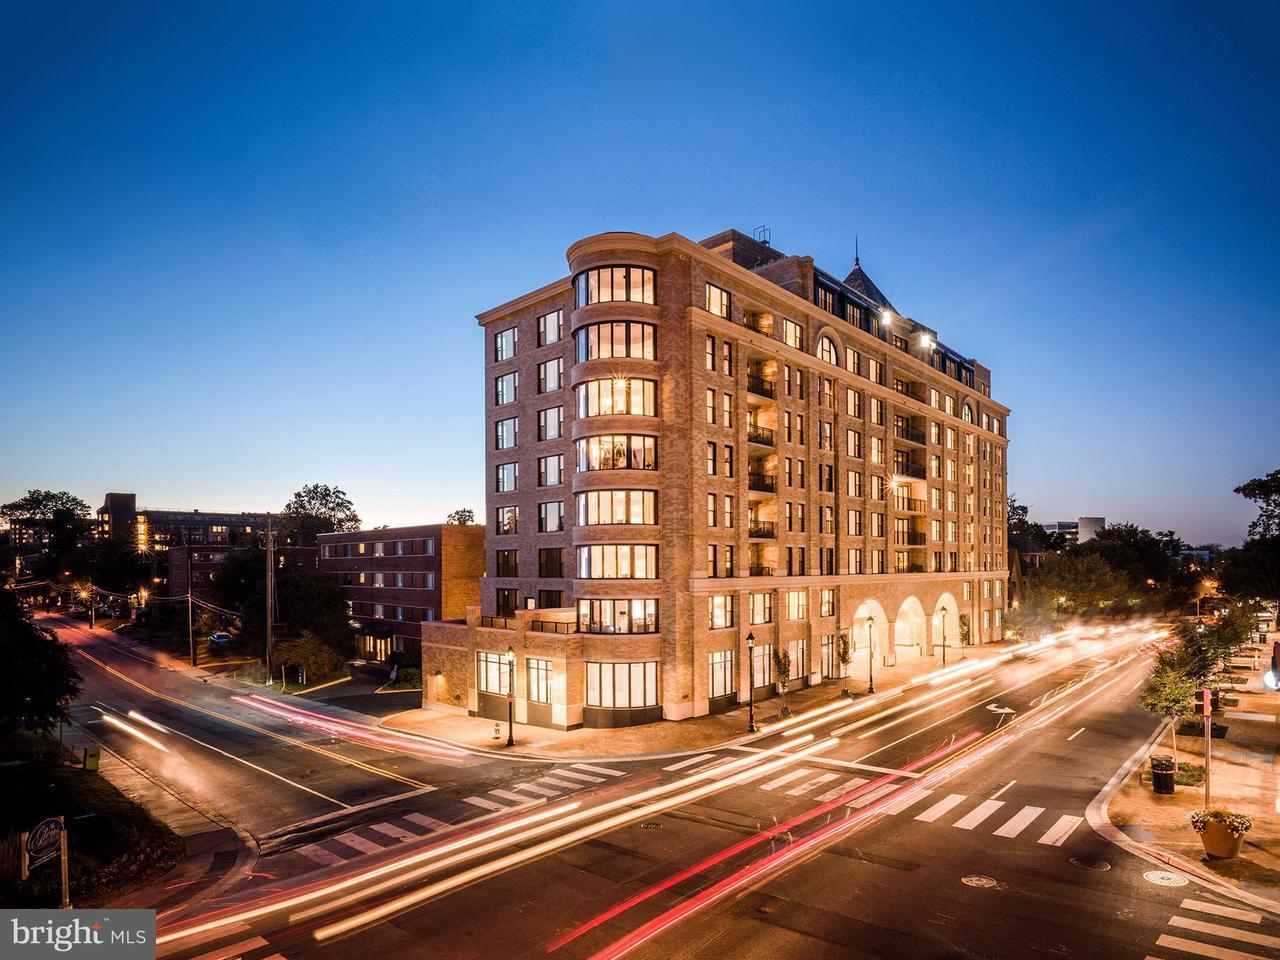 Condominium for Sale at 8302 Woodmont Ave #702 Bethesda, Maryland 20814 United States